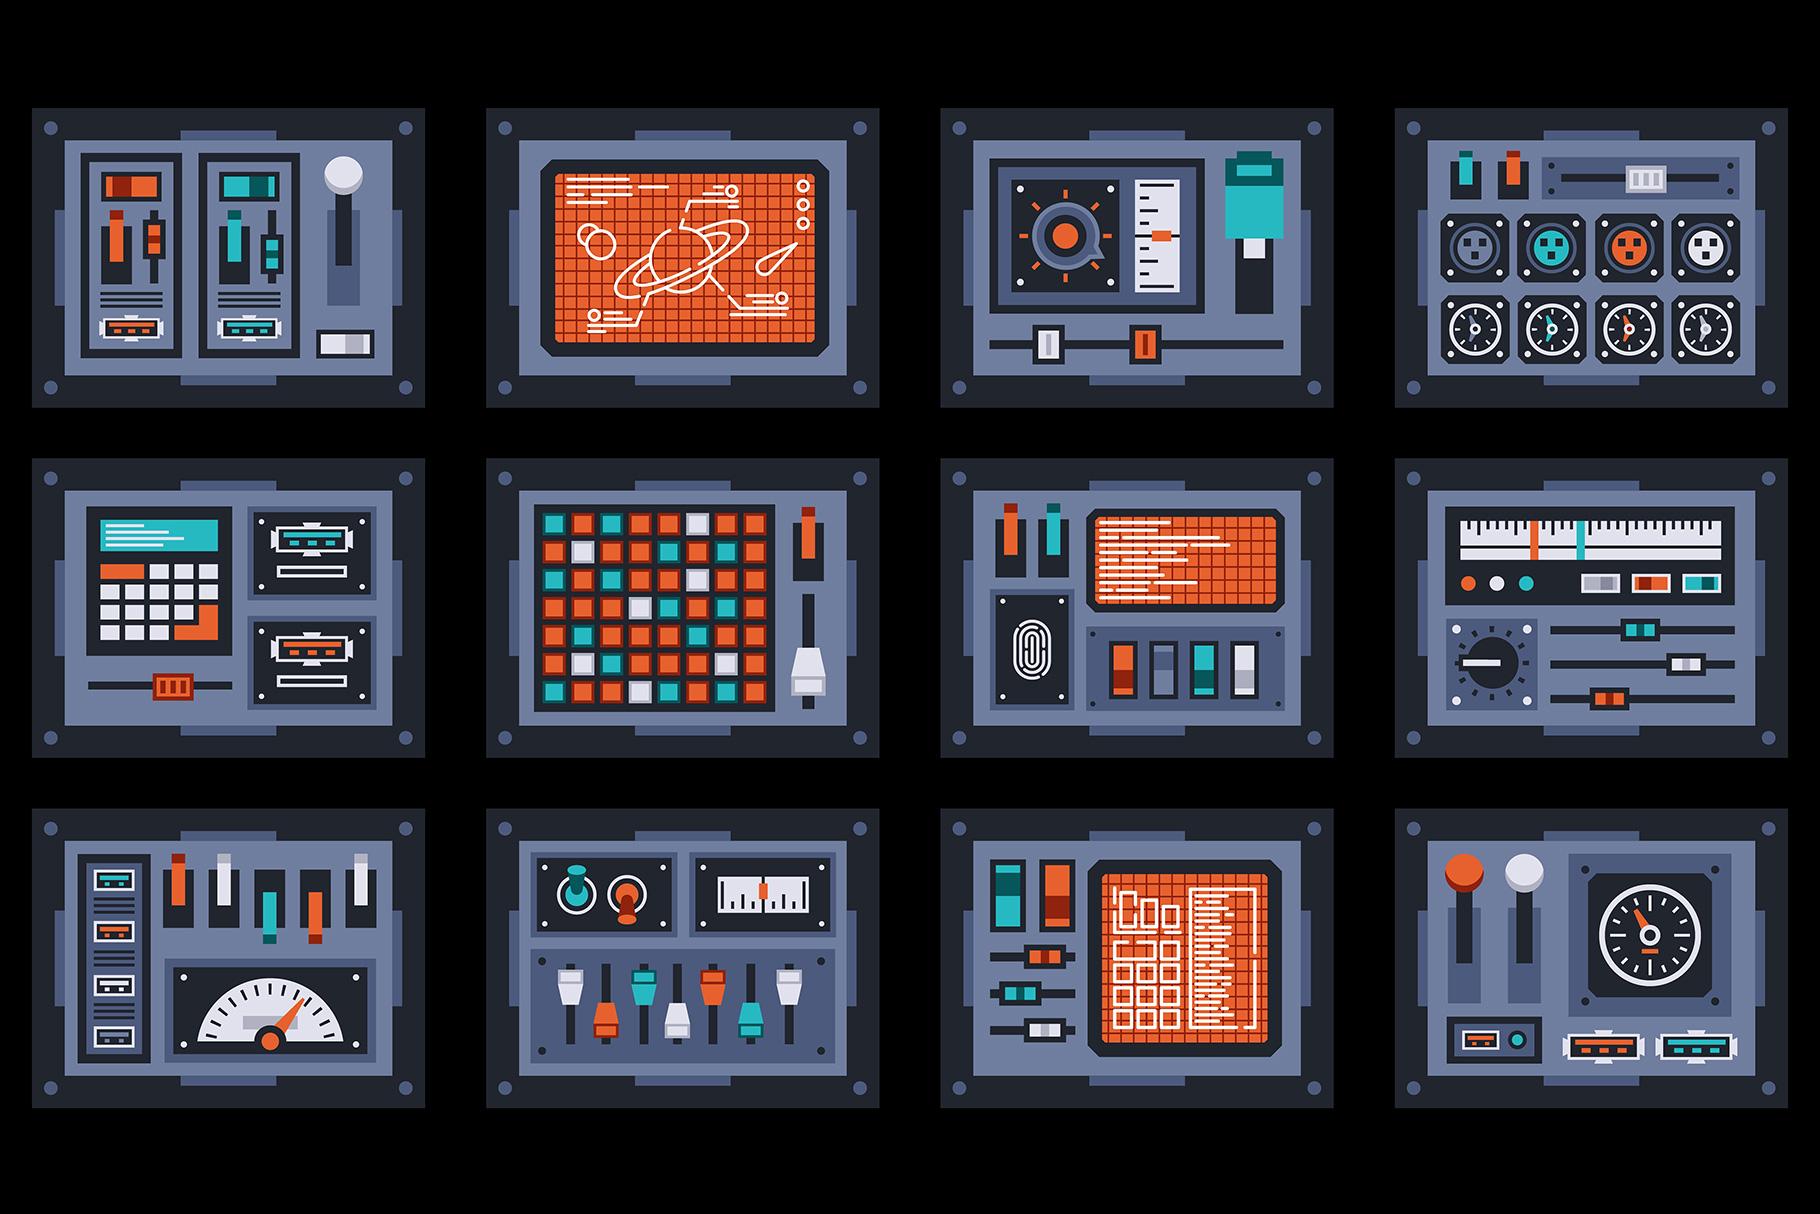 Control Panels Spaceship example image 4